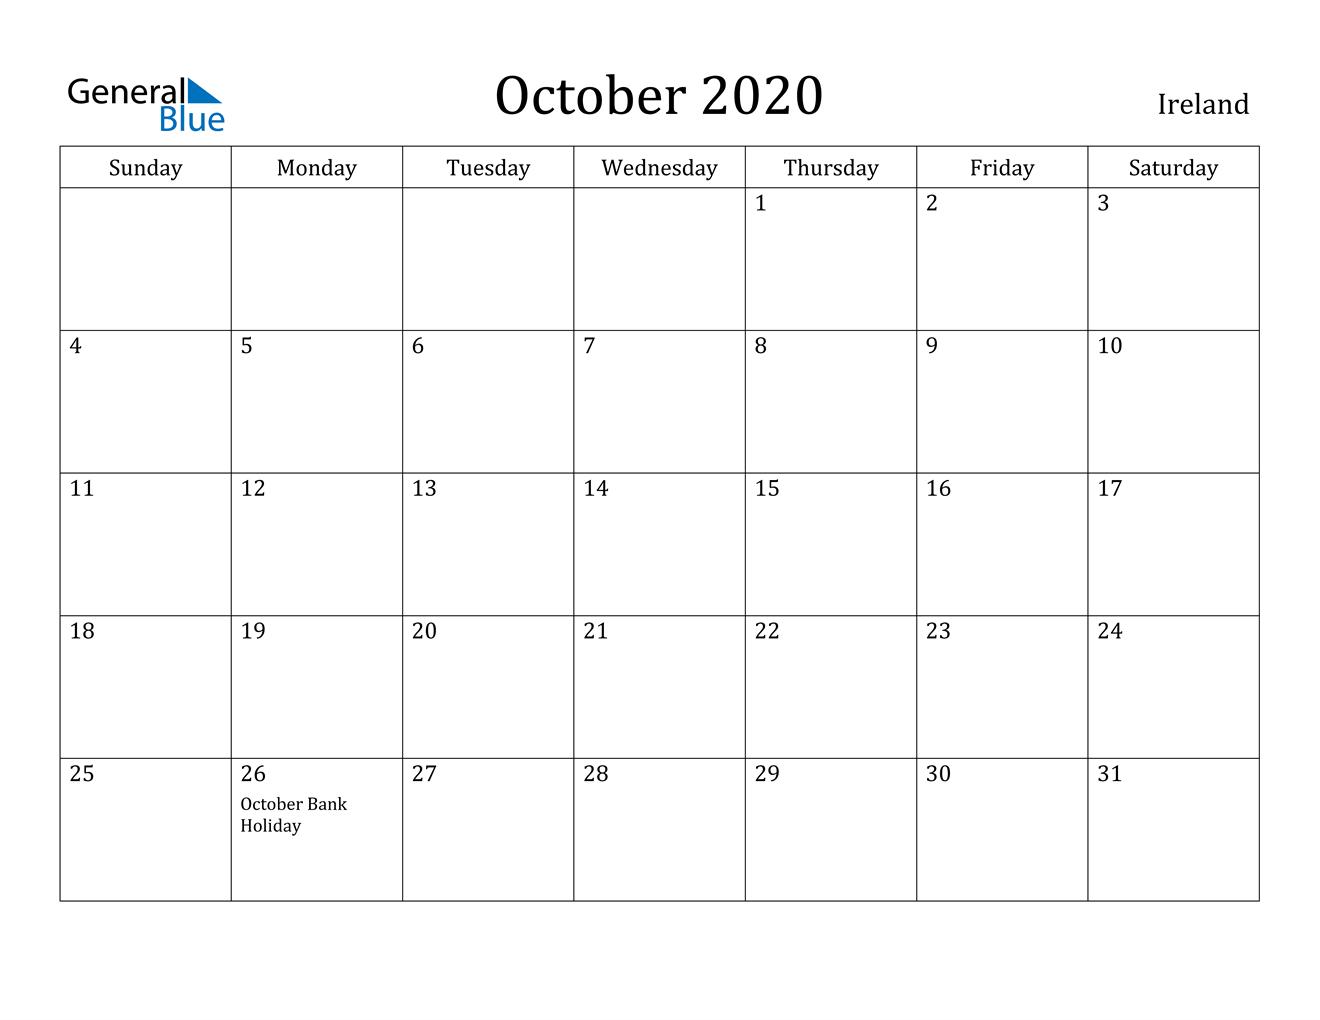 October 2020 Calendar - Ireland